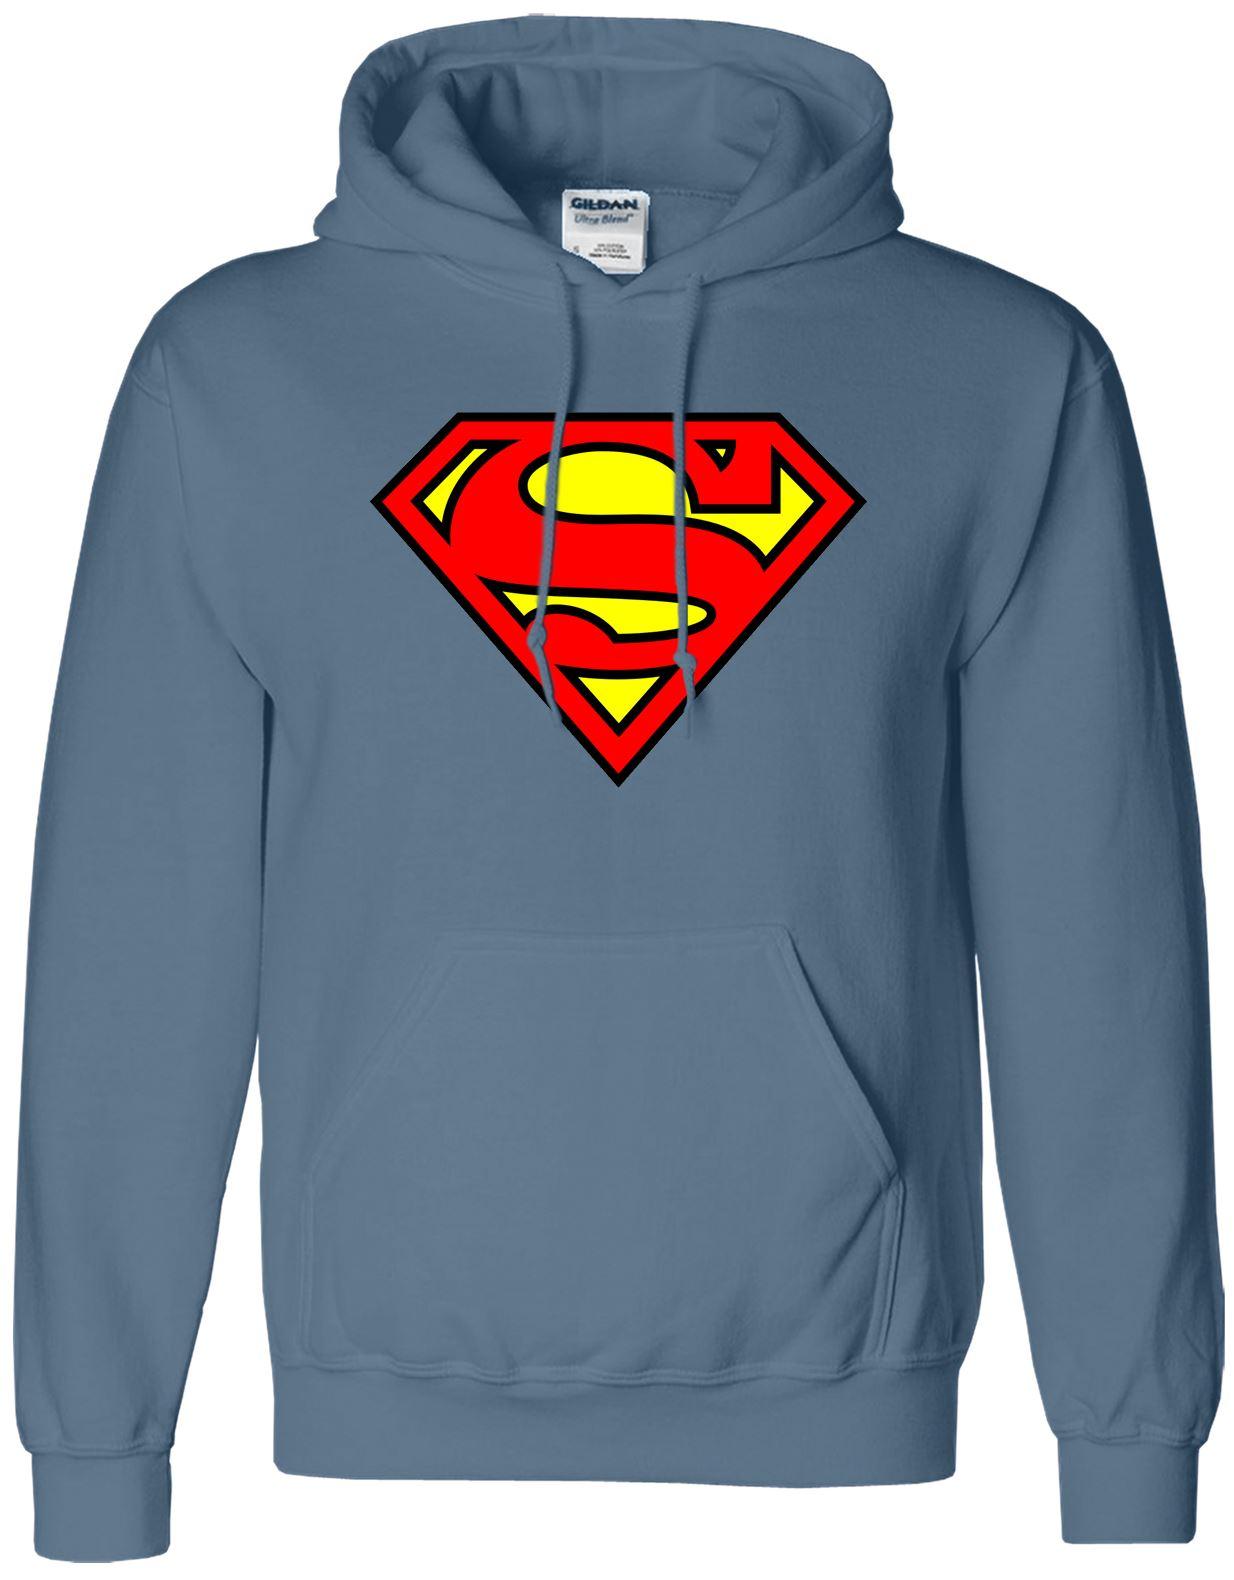 Superman hoodies for men